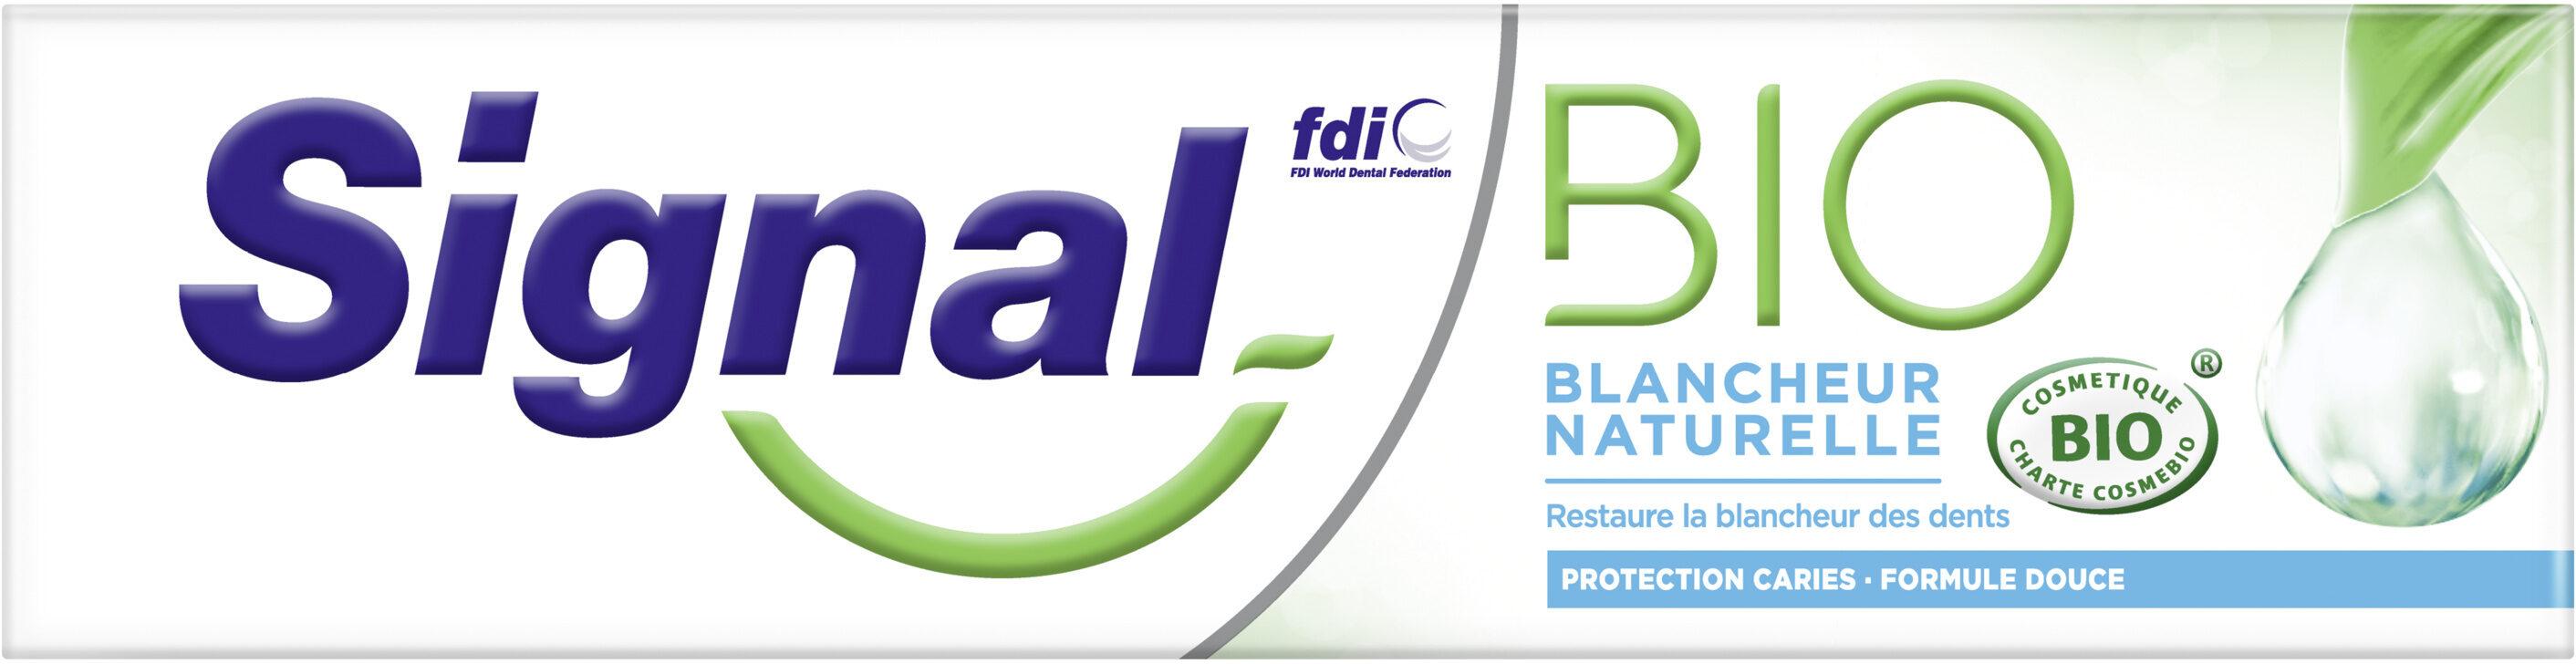 Signal Dentifrice Bio Blancheur Naturelle - Product - fr